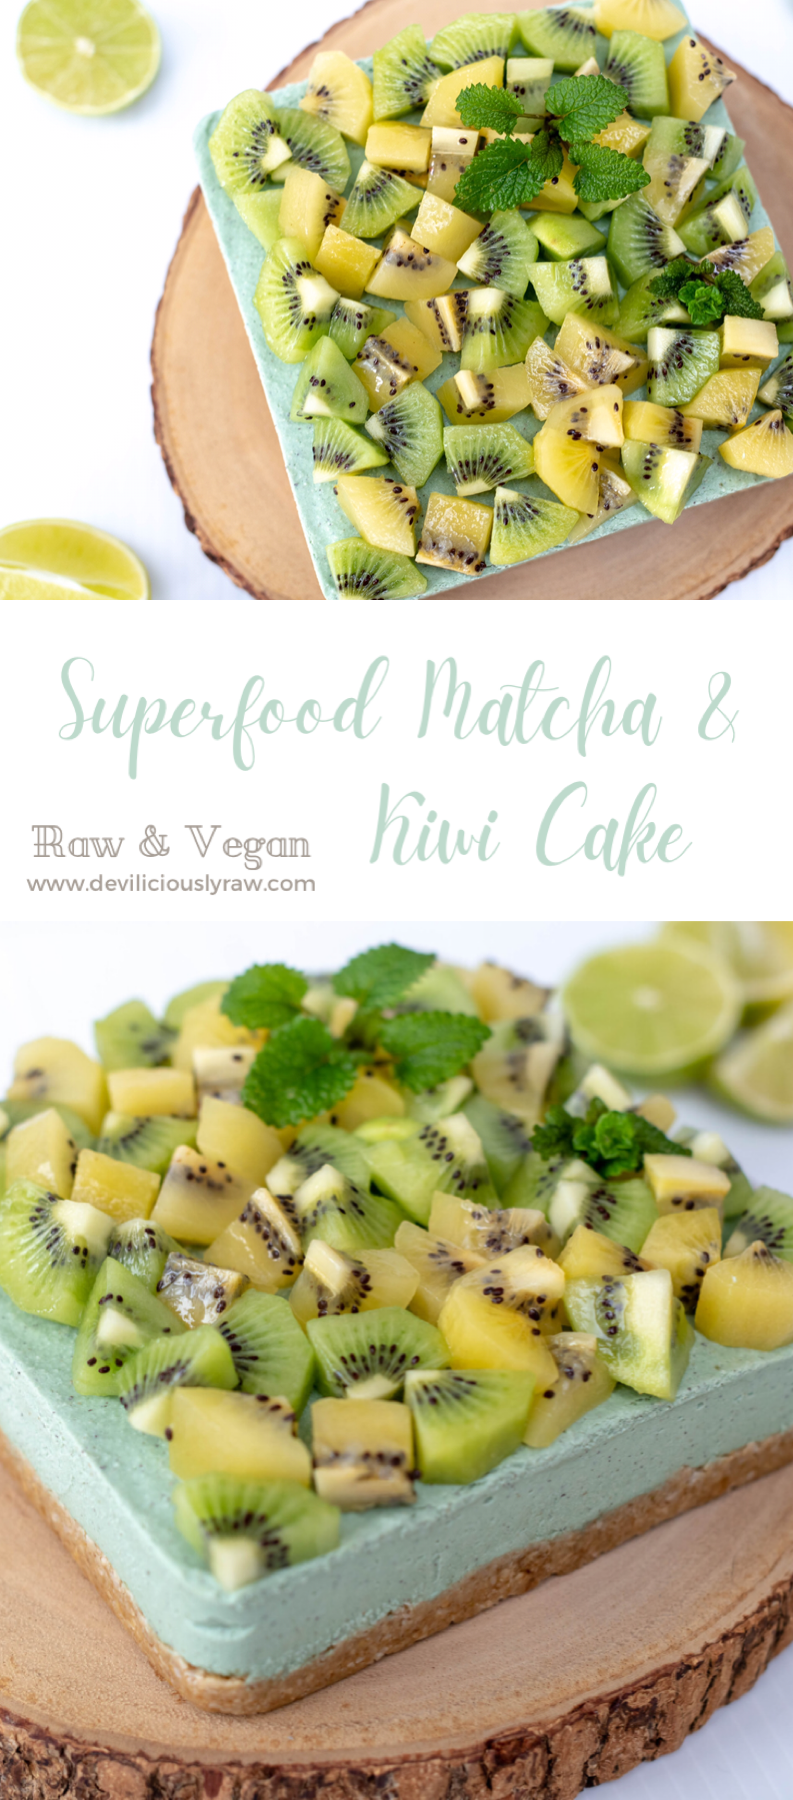 Raw Superfood Matcha & Kiwi Cake with Ginger Crust